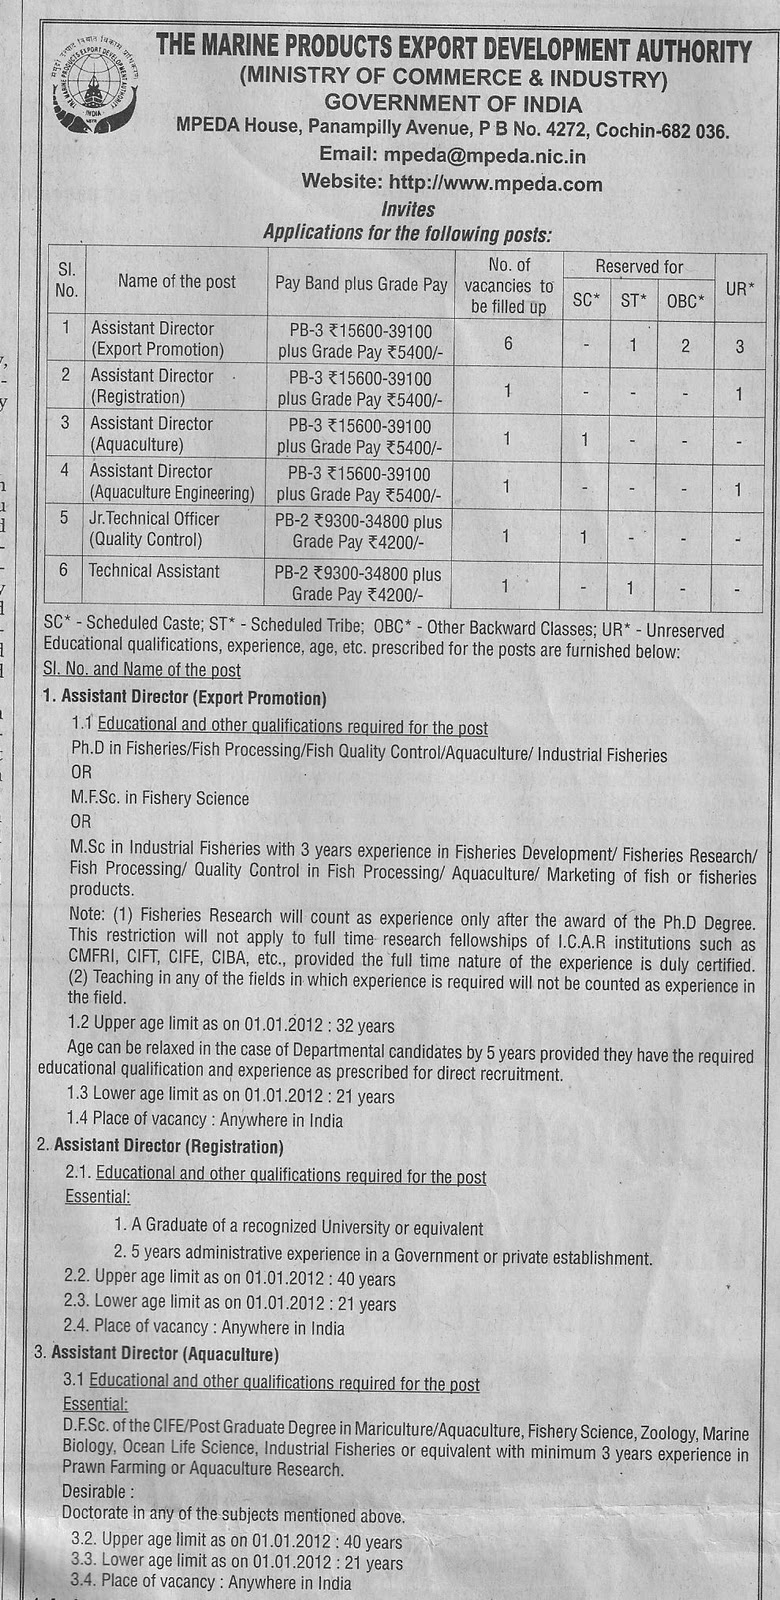 tn govt jobs: 01/28/12